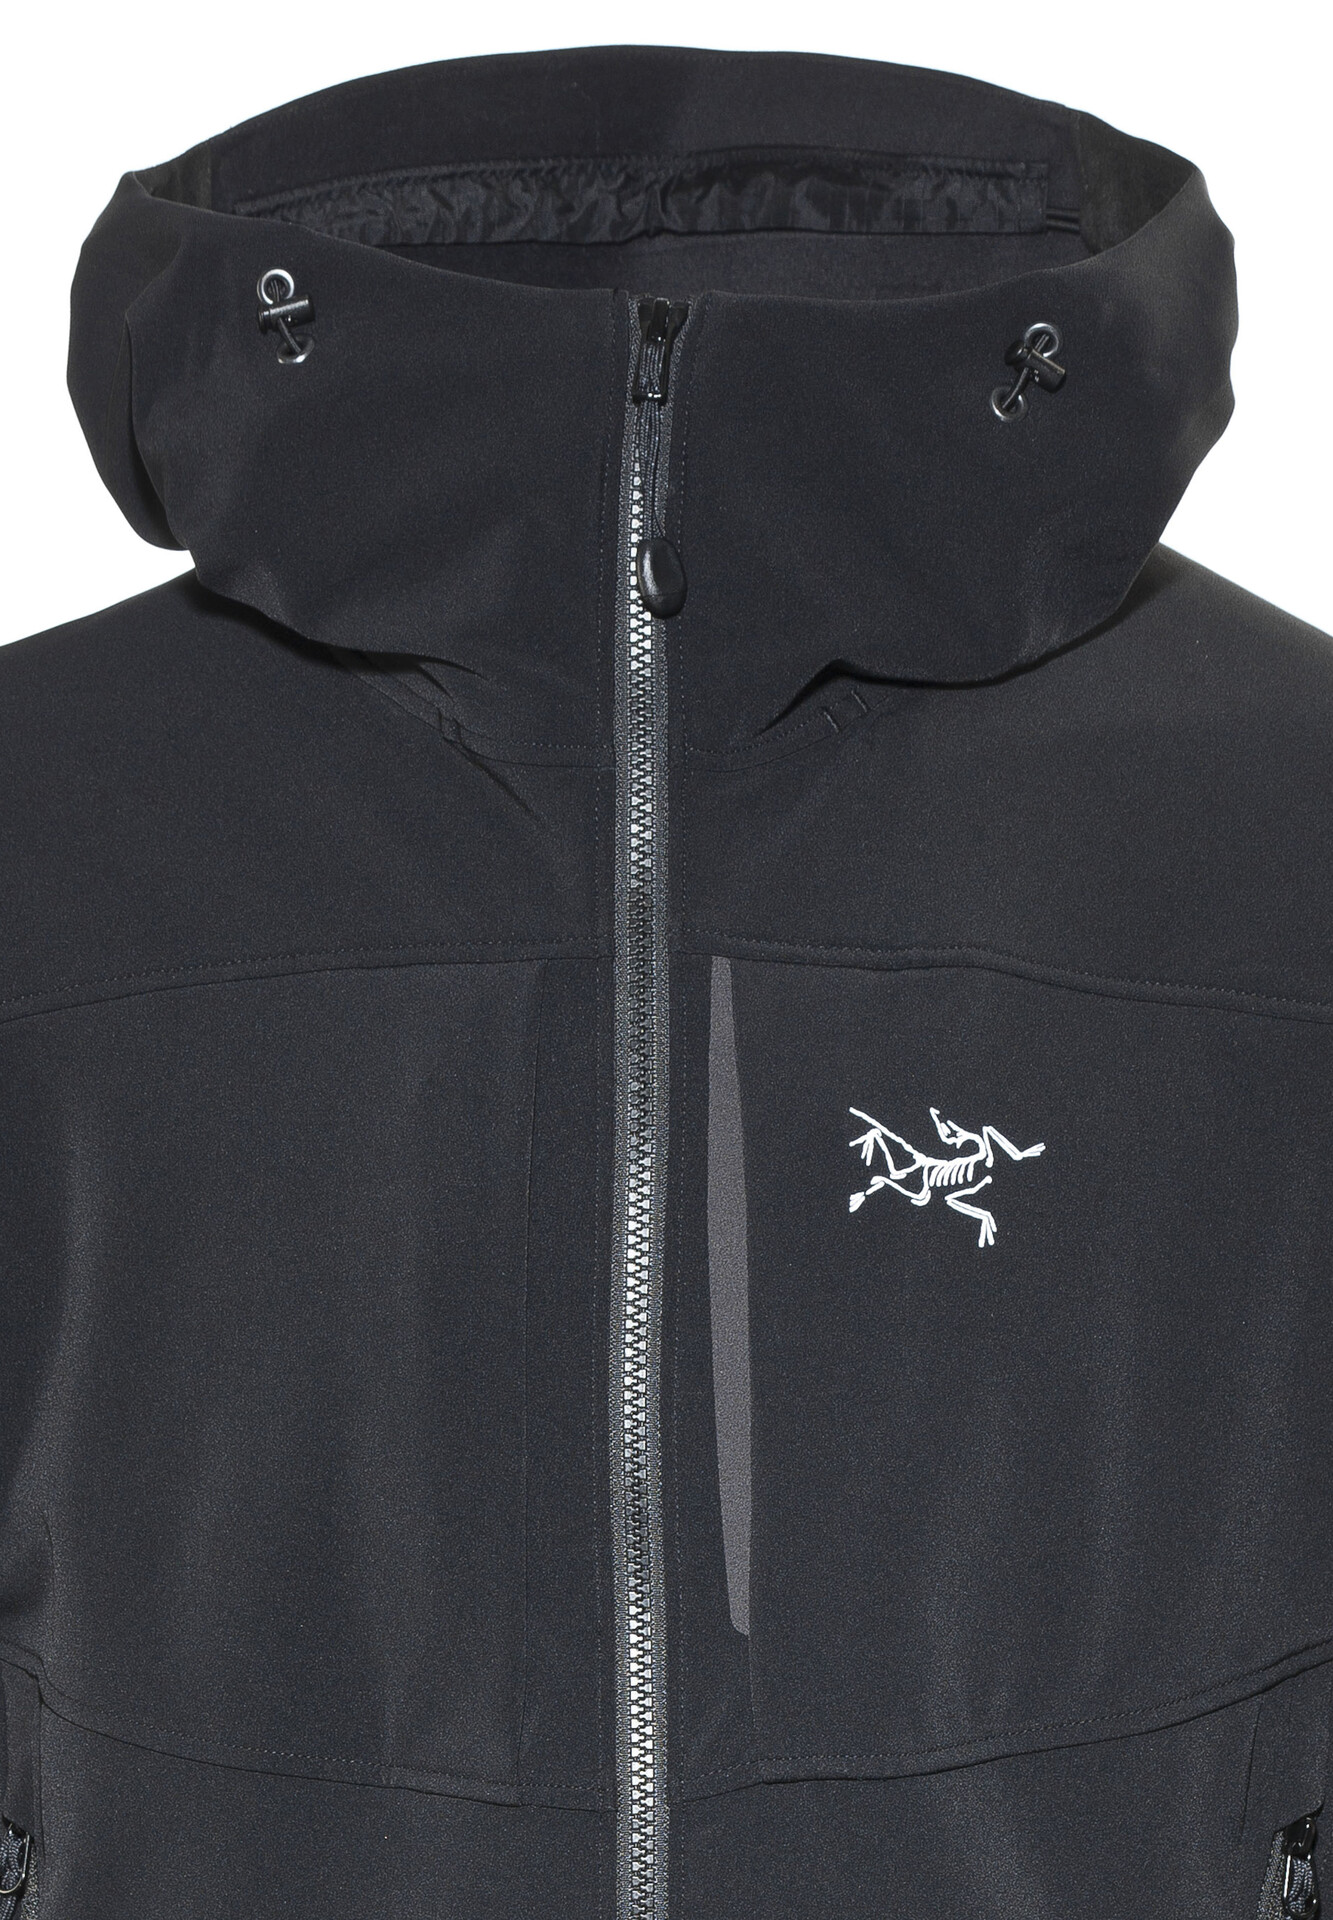 Arcteryx Gamma MX Sweat /à Capuche Homme